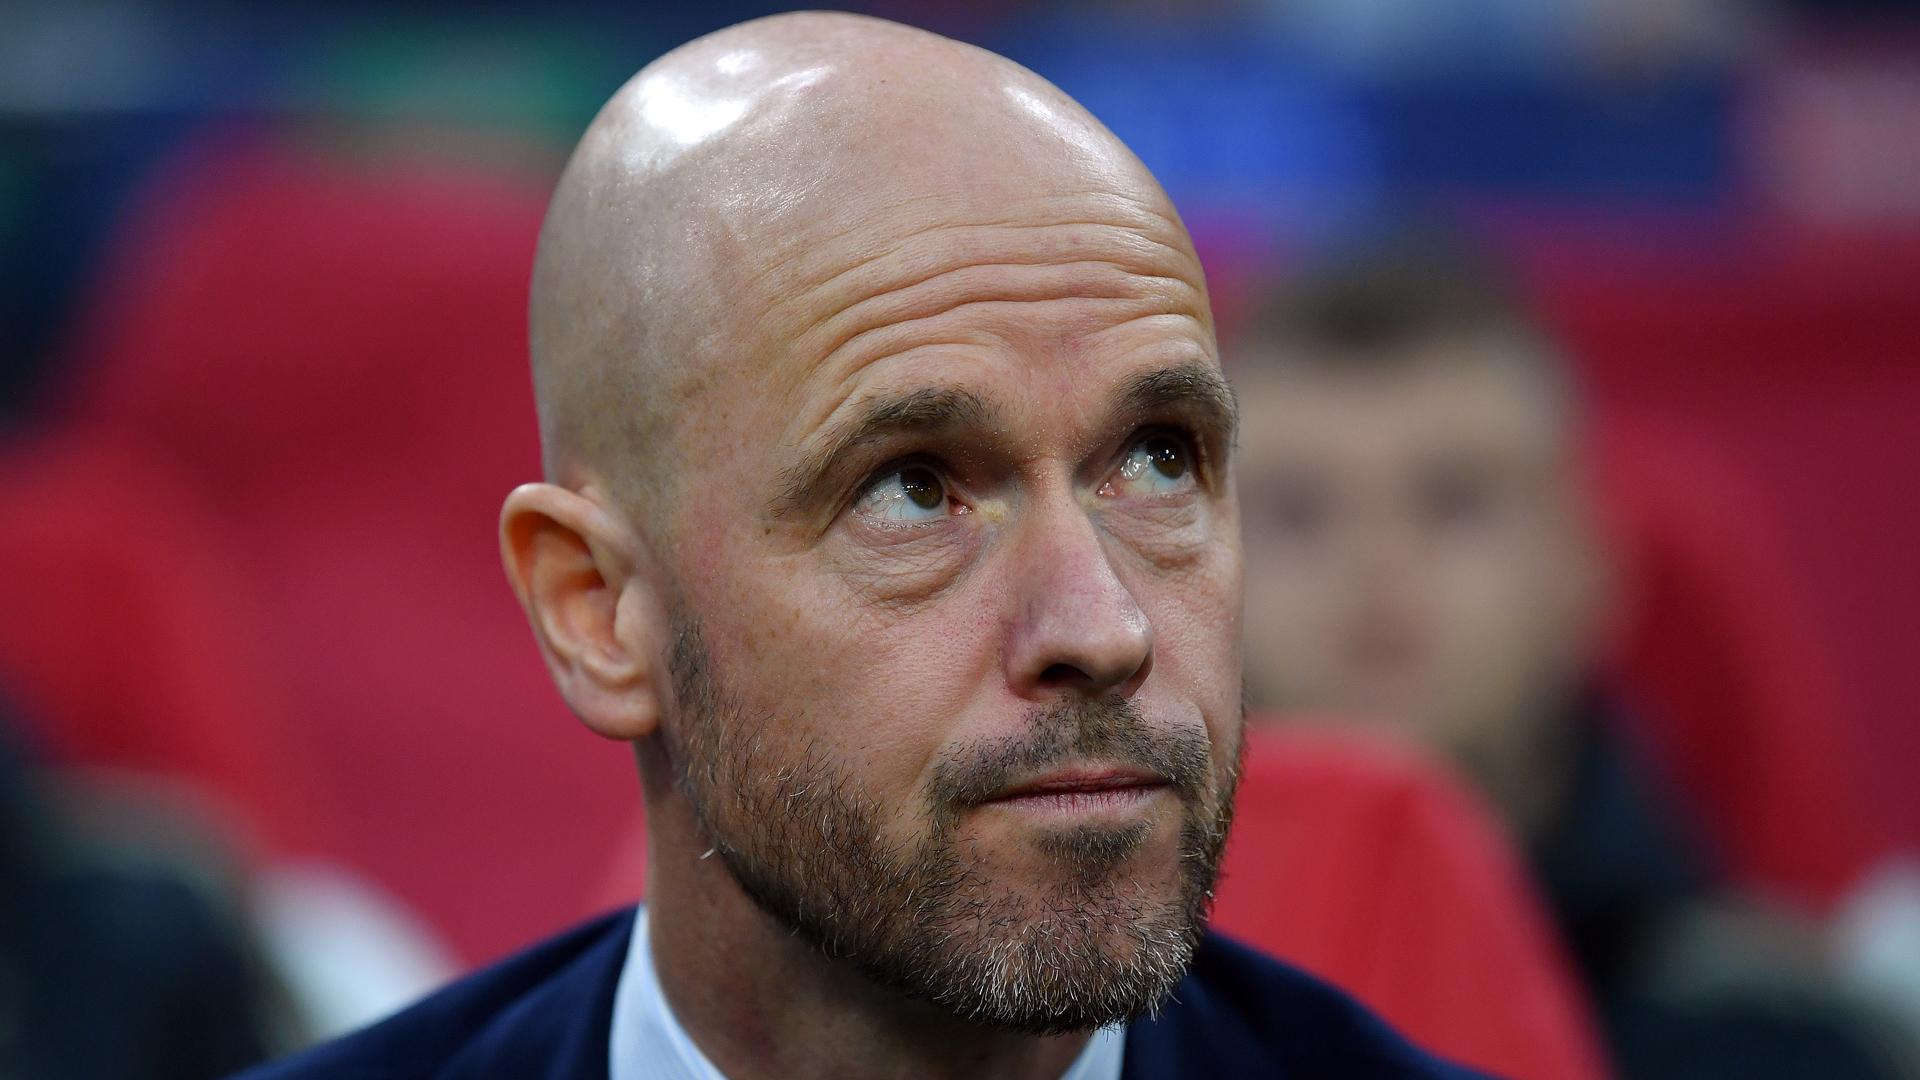 Ten Hag wants Ajax to 'play smarter' despite convincing win